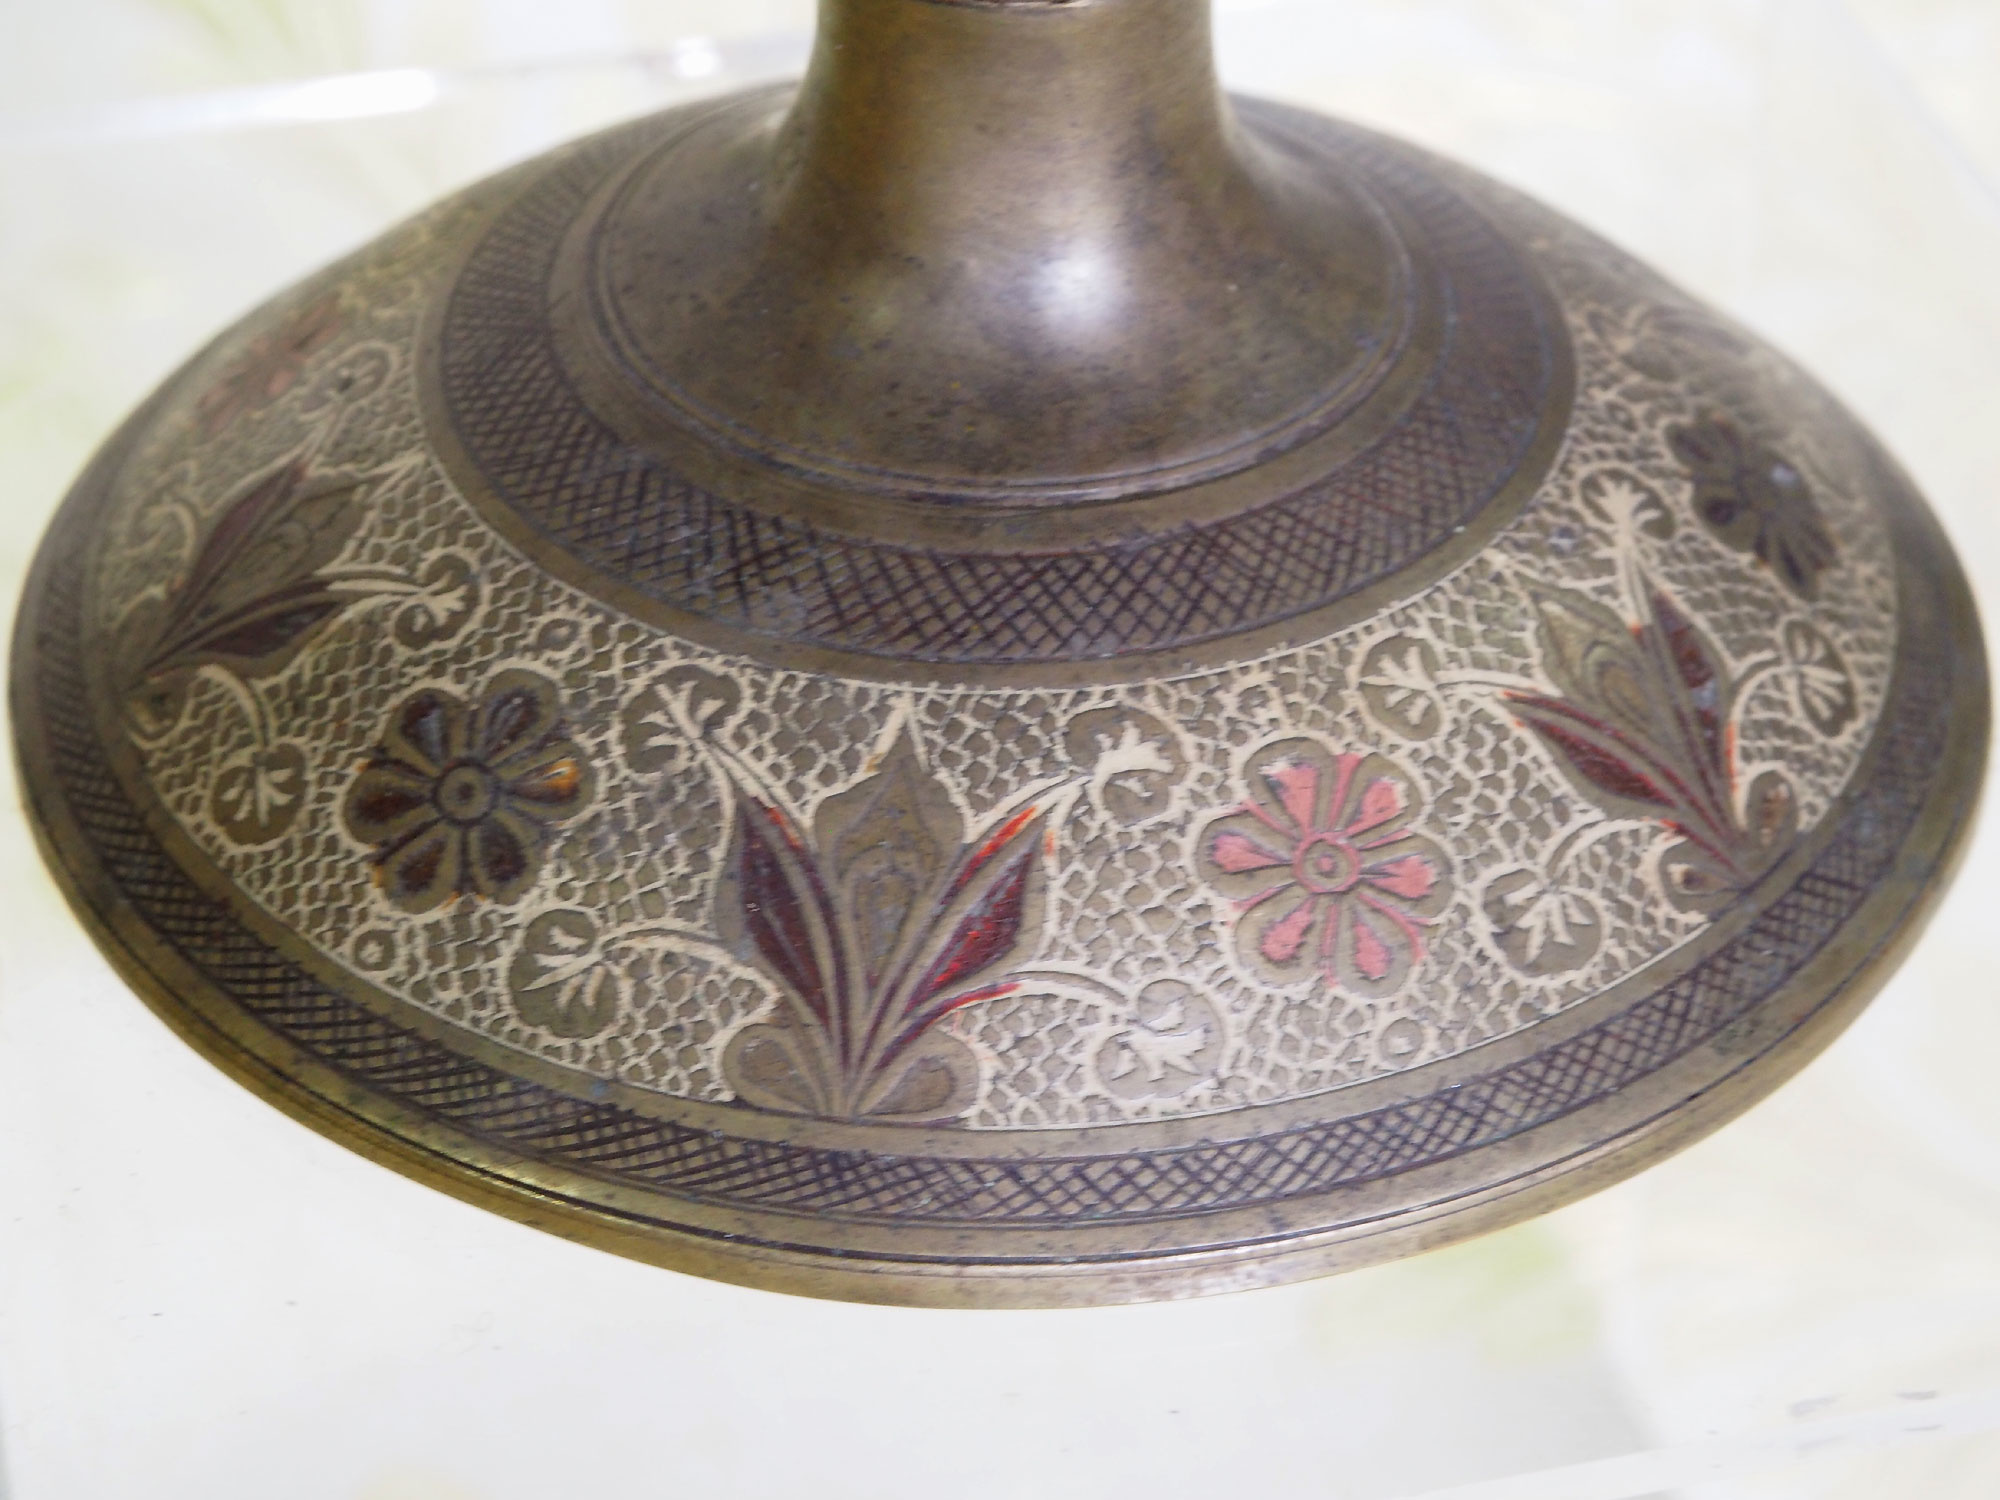 antik Emailarbeit Vase topf schale fußschale Messing Kahmir indien Nr:19/8